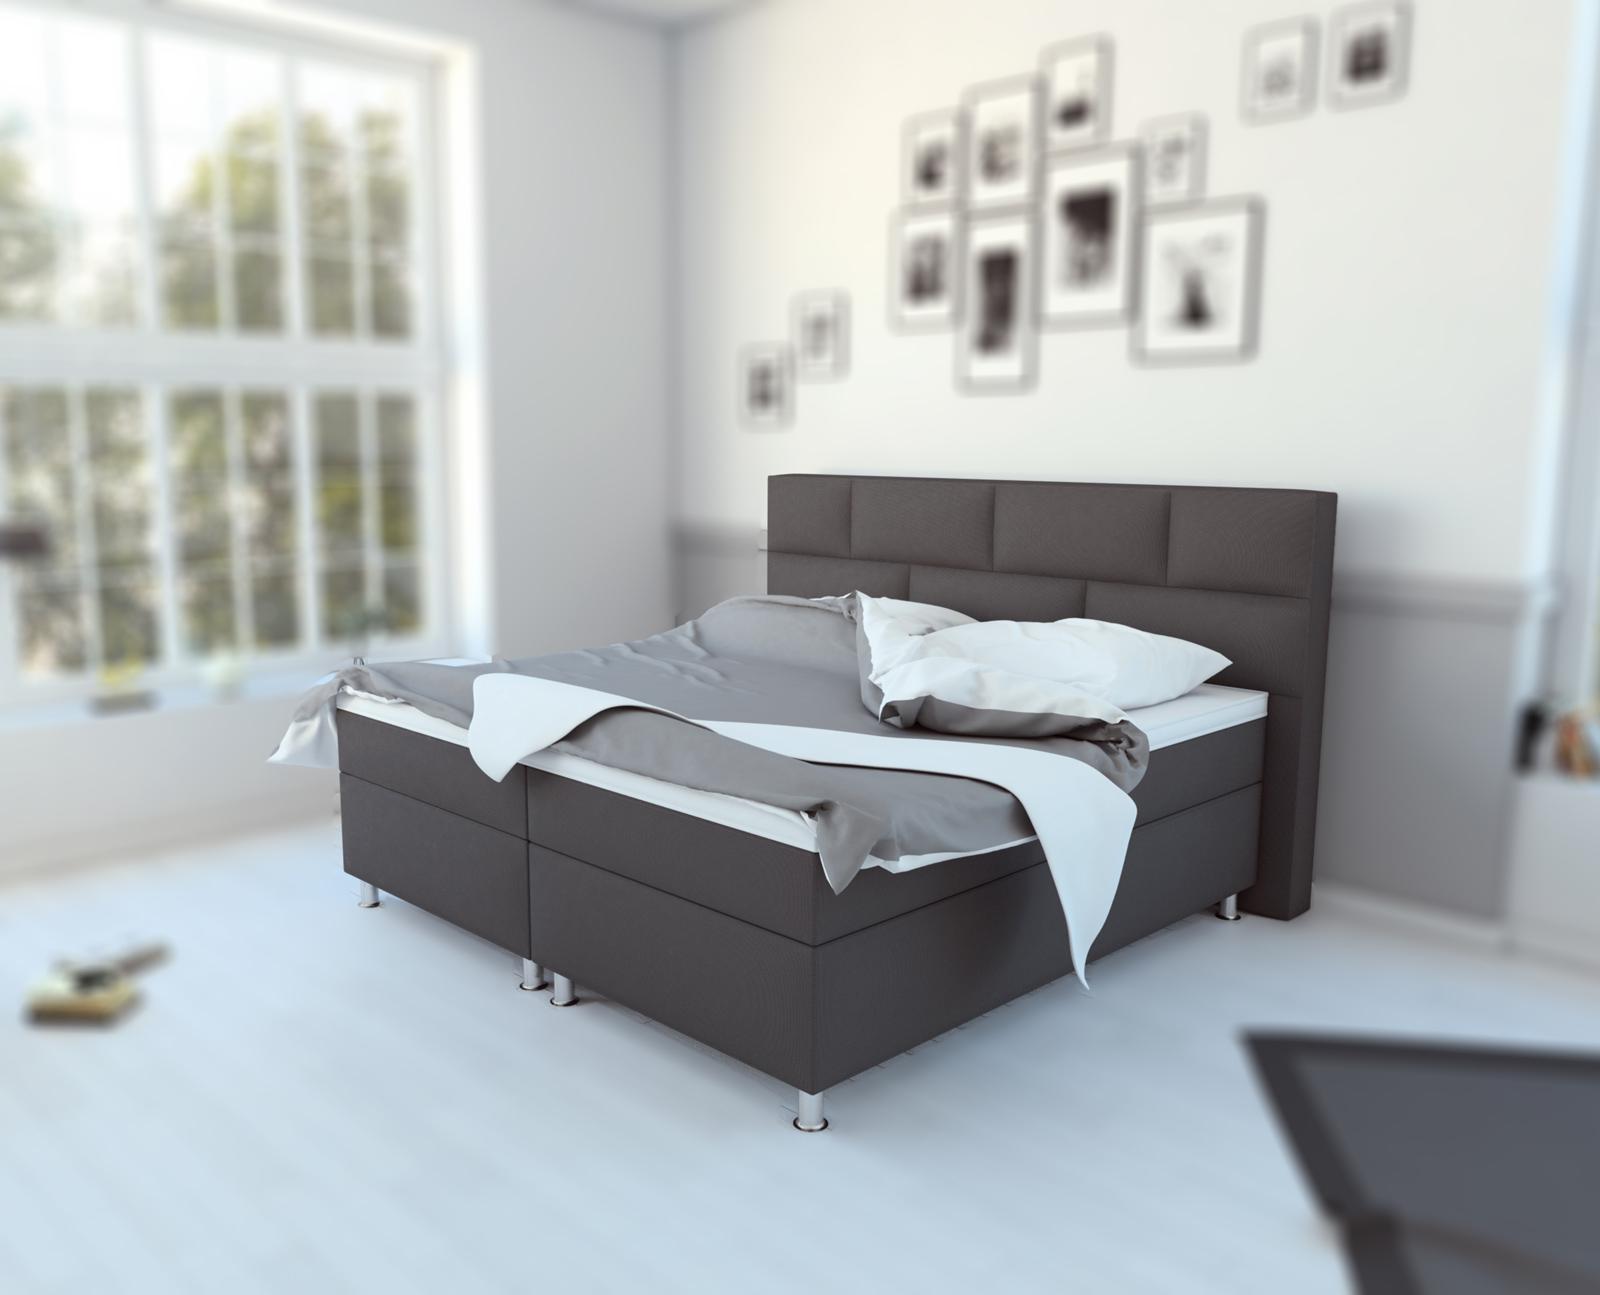 sale boxspringbett hotelbett 180 x 200 cm stoff grau olivia. Black Bedroom Furniture Sets. Home Design Ideas